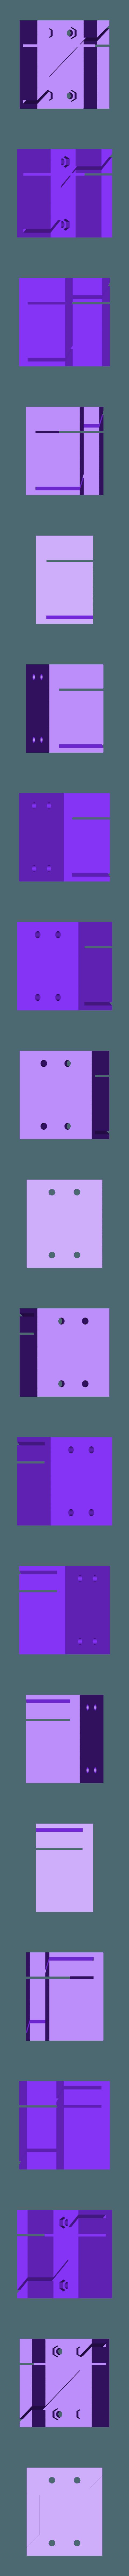 dispozitiv de taiere in unghi.stl Download free STL file CLAMPING MITRE BOX • Design to 3D print, CNCEVOLUTION